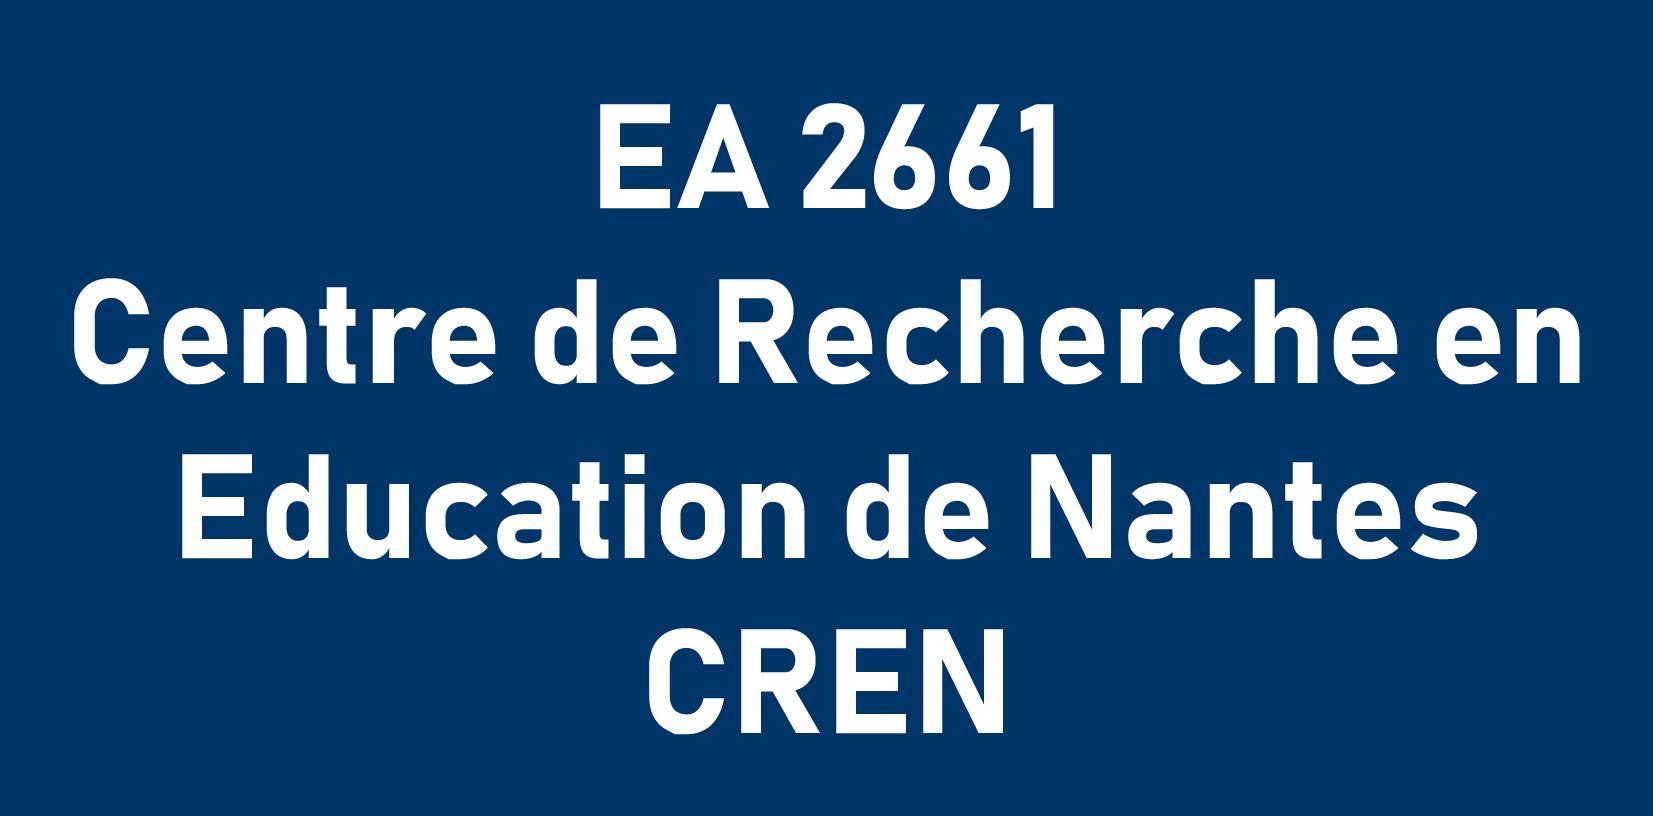 EA 2661 Centre de Recherche en Education de Nantes